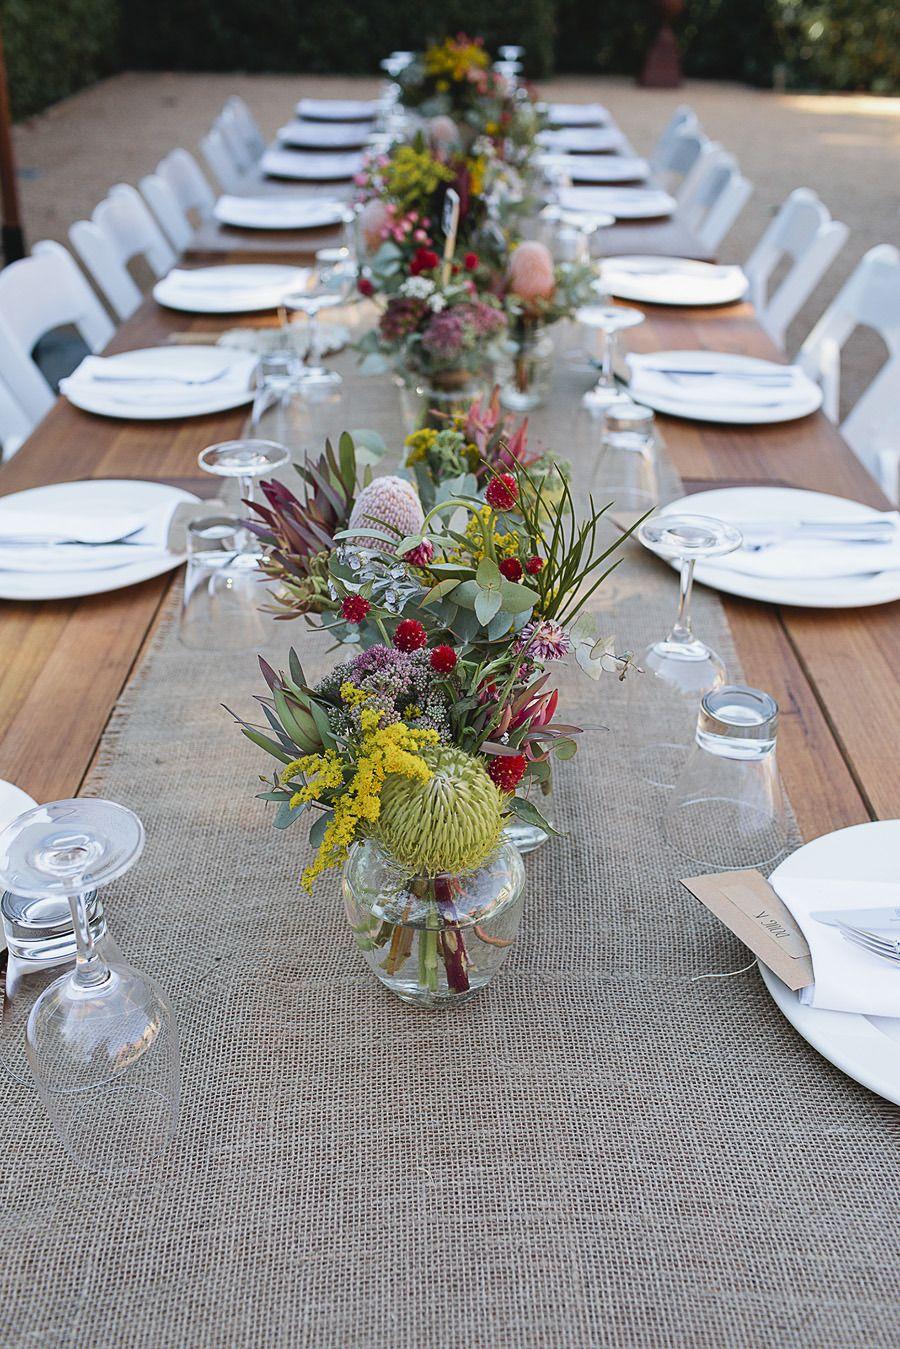 Diy Victoria Wedding At Euroa Butter Factory Wedding Table Flowers Wedding Table Decorations Diy Australian Christmas